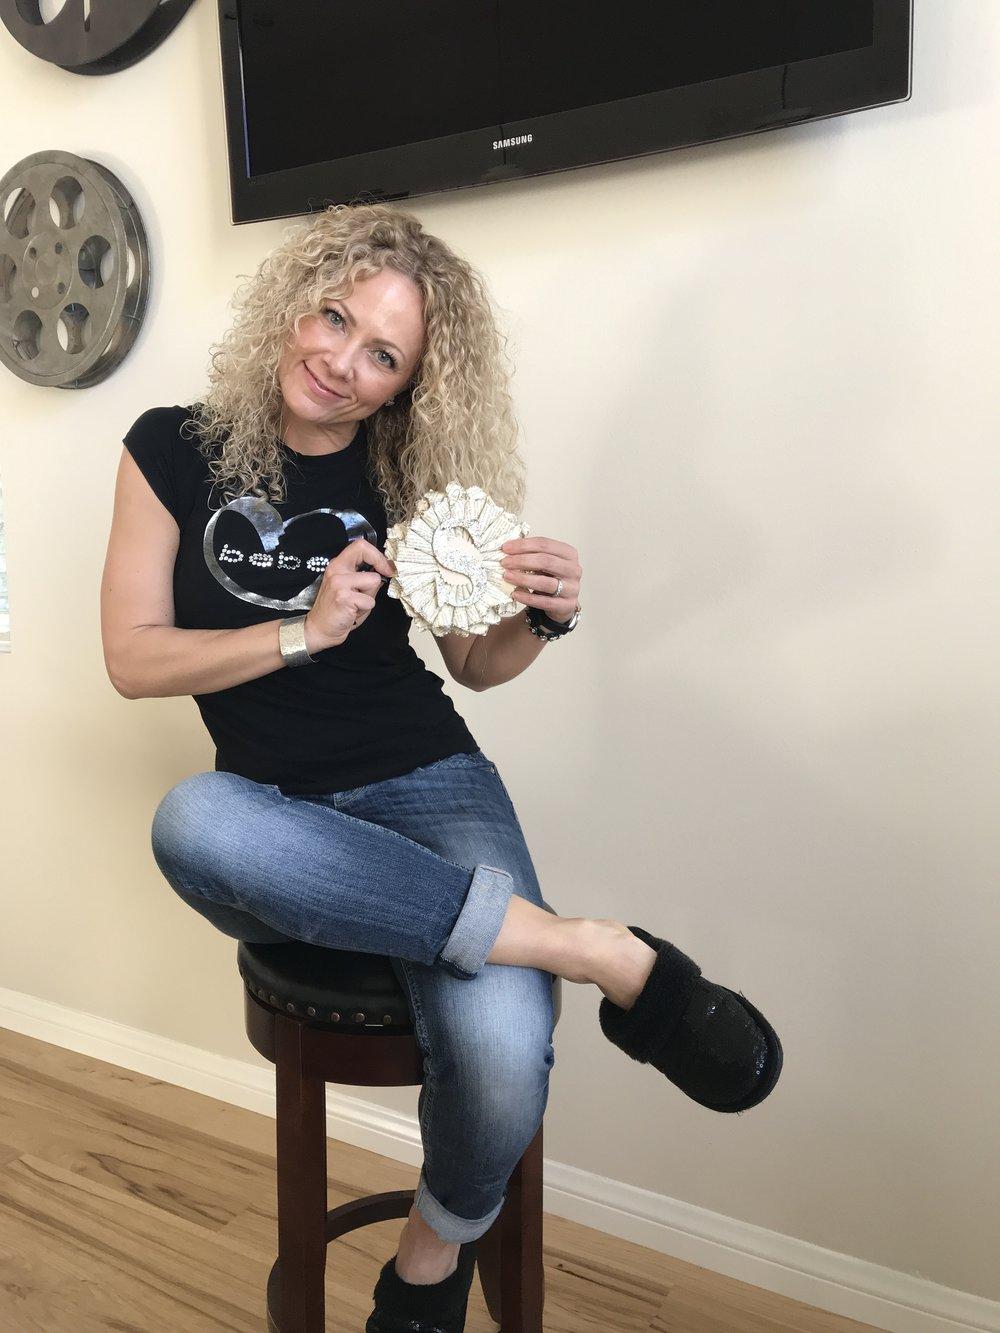 Sequin Slippers- Abound brand Nordstrom rack  Vigoss Jeans- Norrdstrom  Bebe T-shirt - BEBE  Jewelry - Danielle Dunlap designs